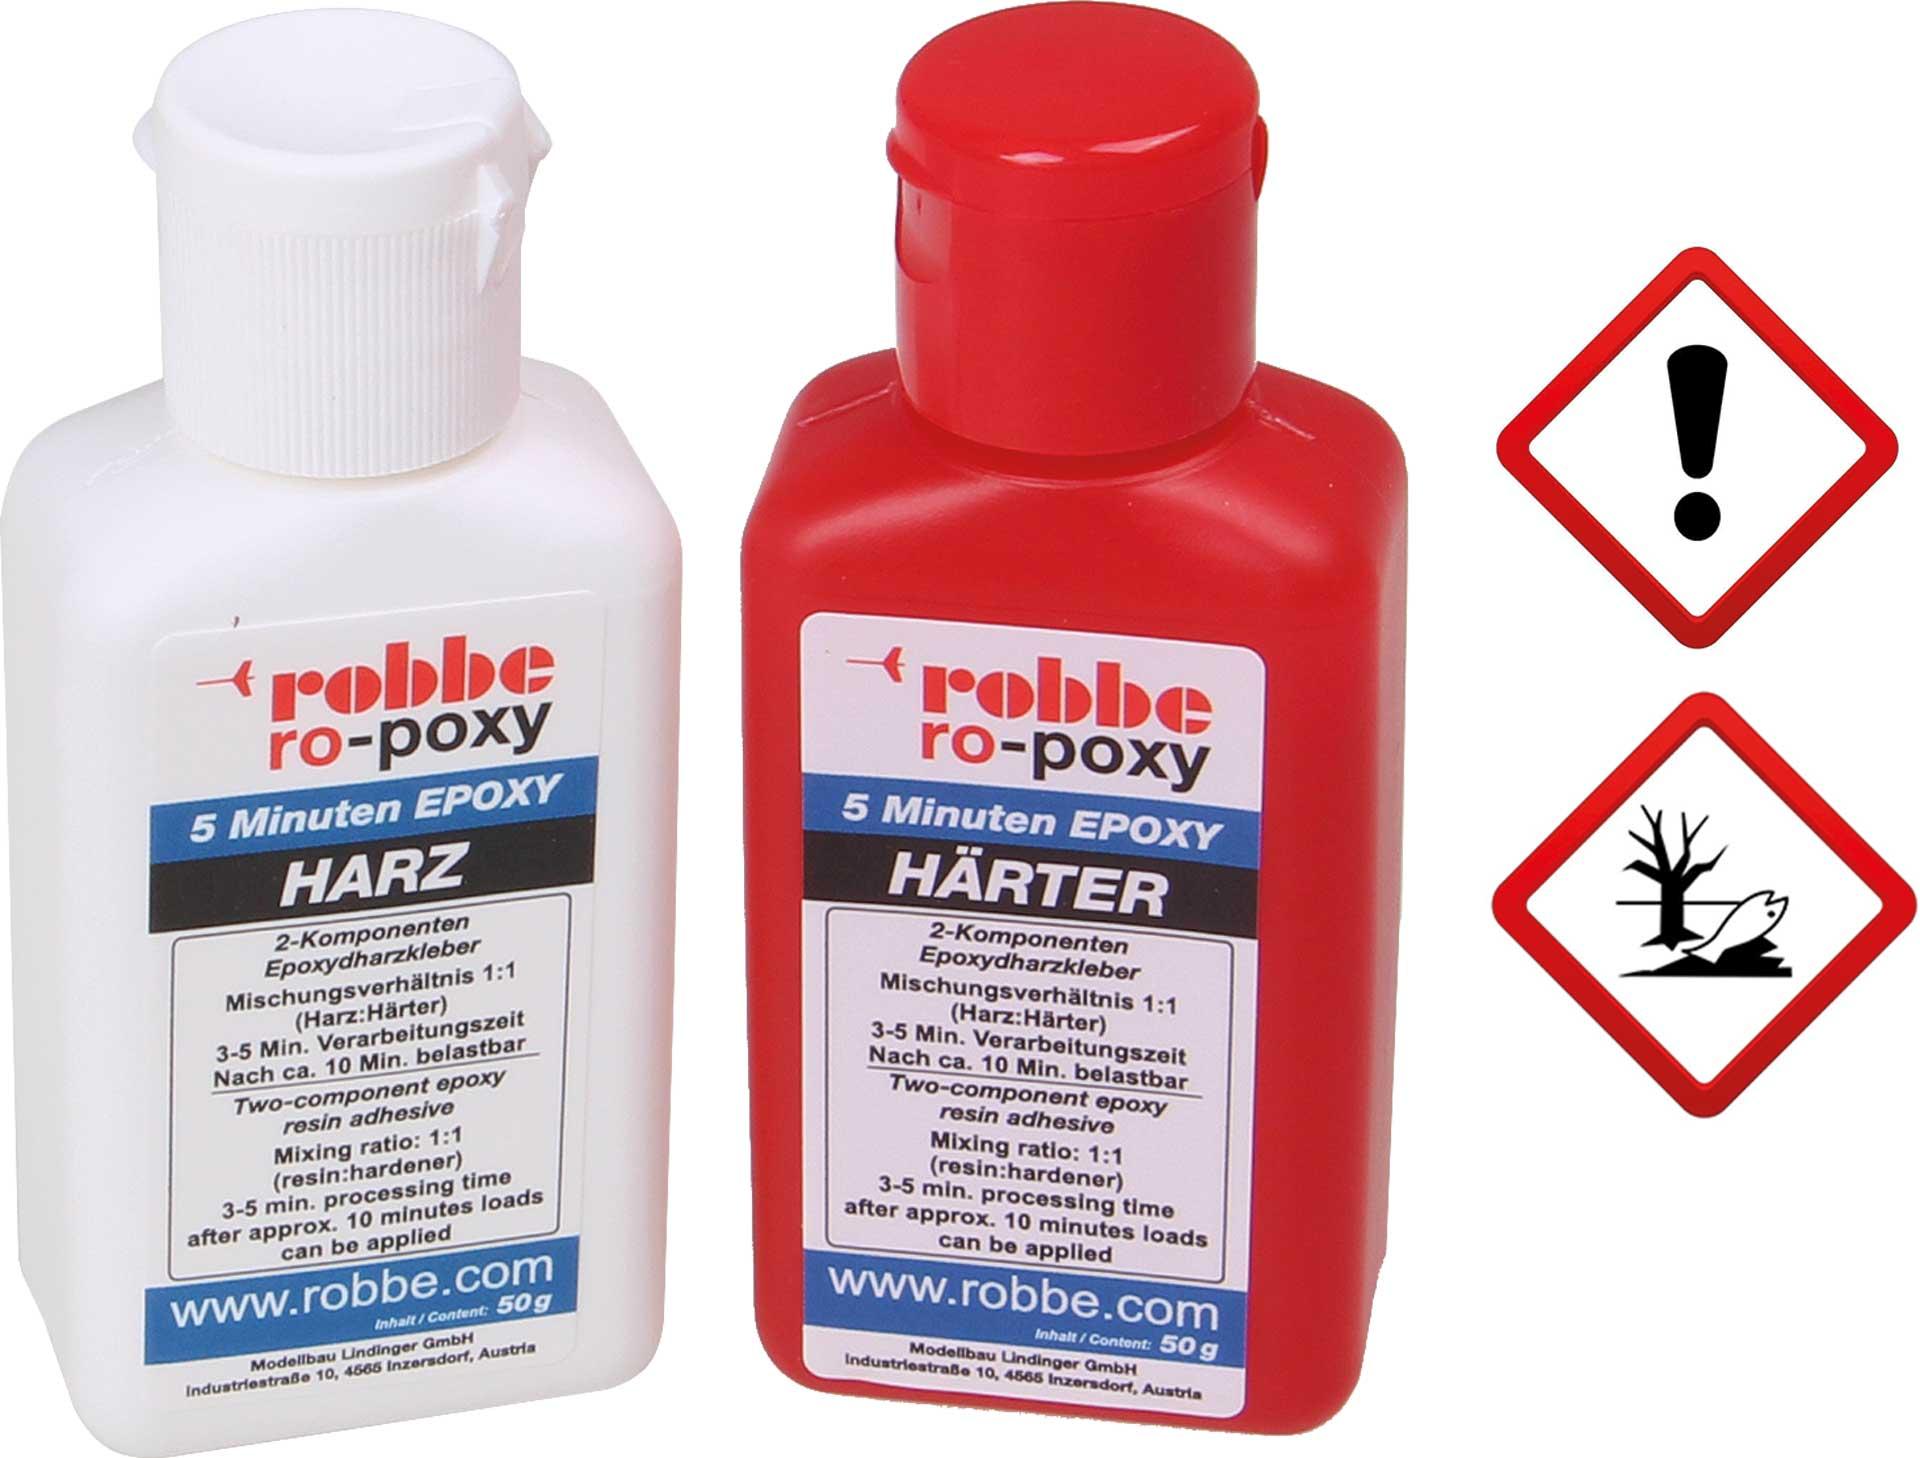 Robbe Modellsport RO-POXY 5 MINUTEN EPOXYDHARZKLEBER 100G JE 50G HARZ+HÄRTER